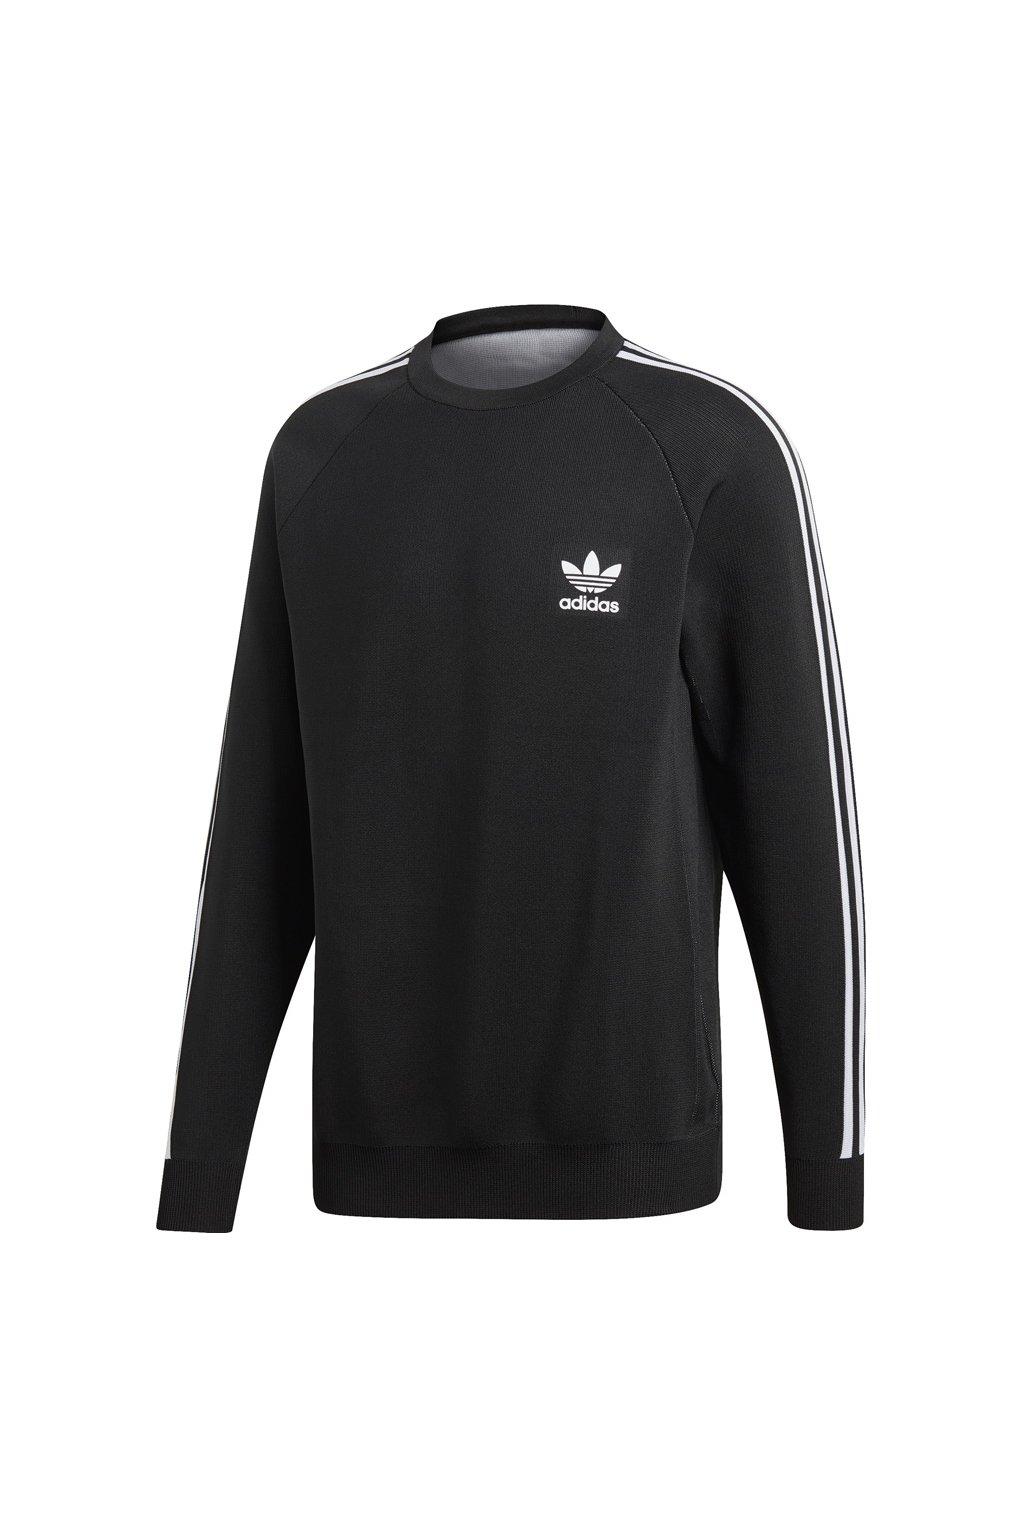 Pánska mikina Adidas Knit Crew black DH5754